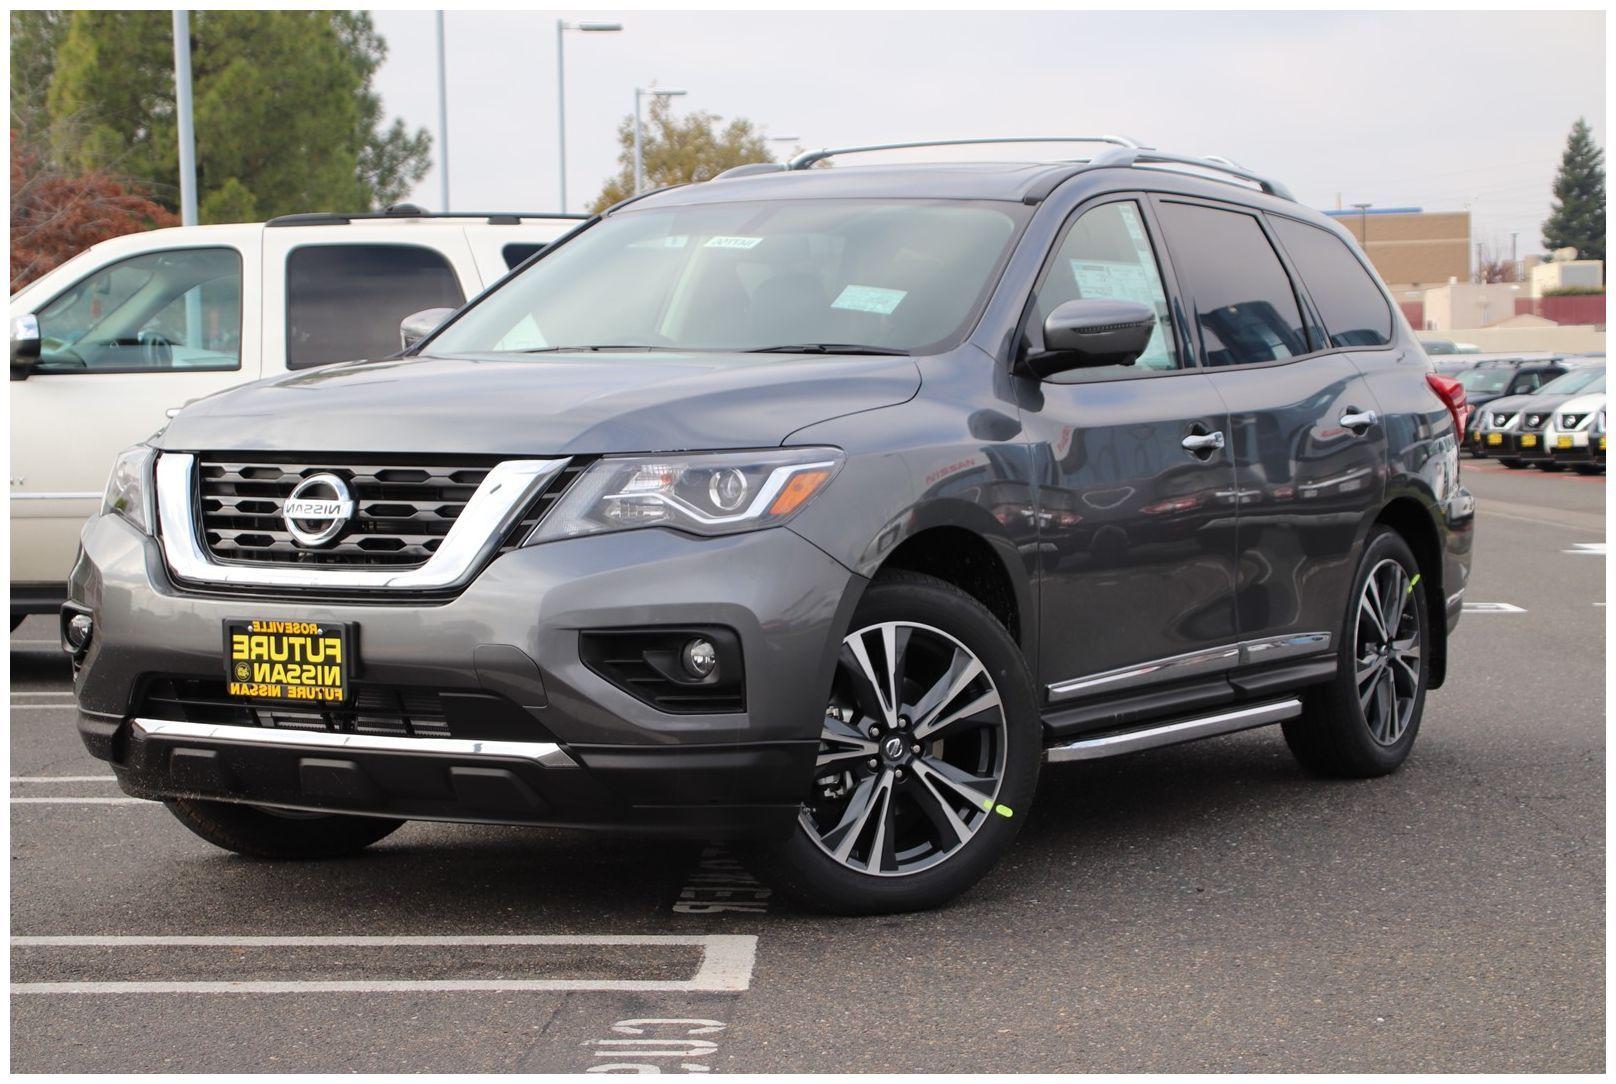 2019 Nissan Pathfinder Nissan pathfinder, Nissan, 2014